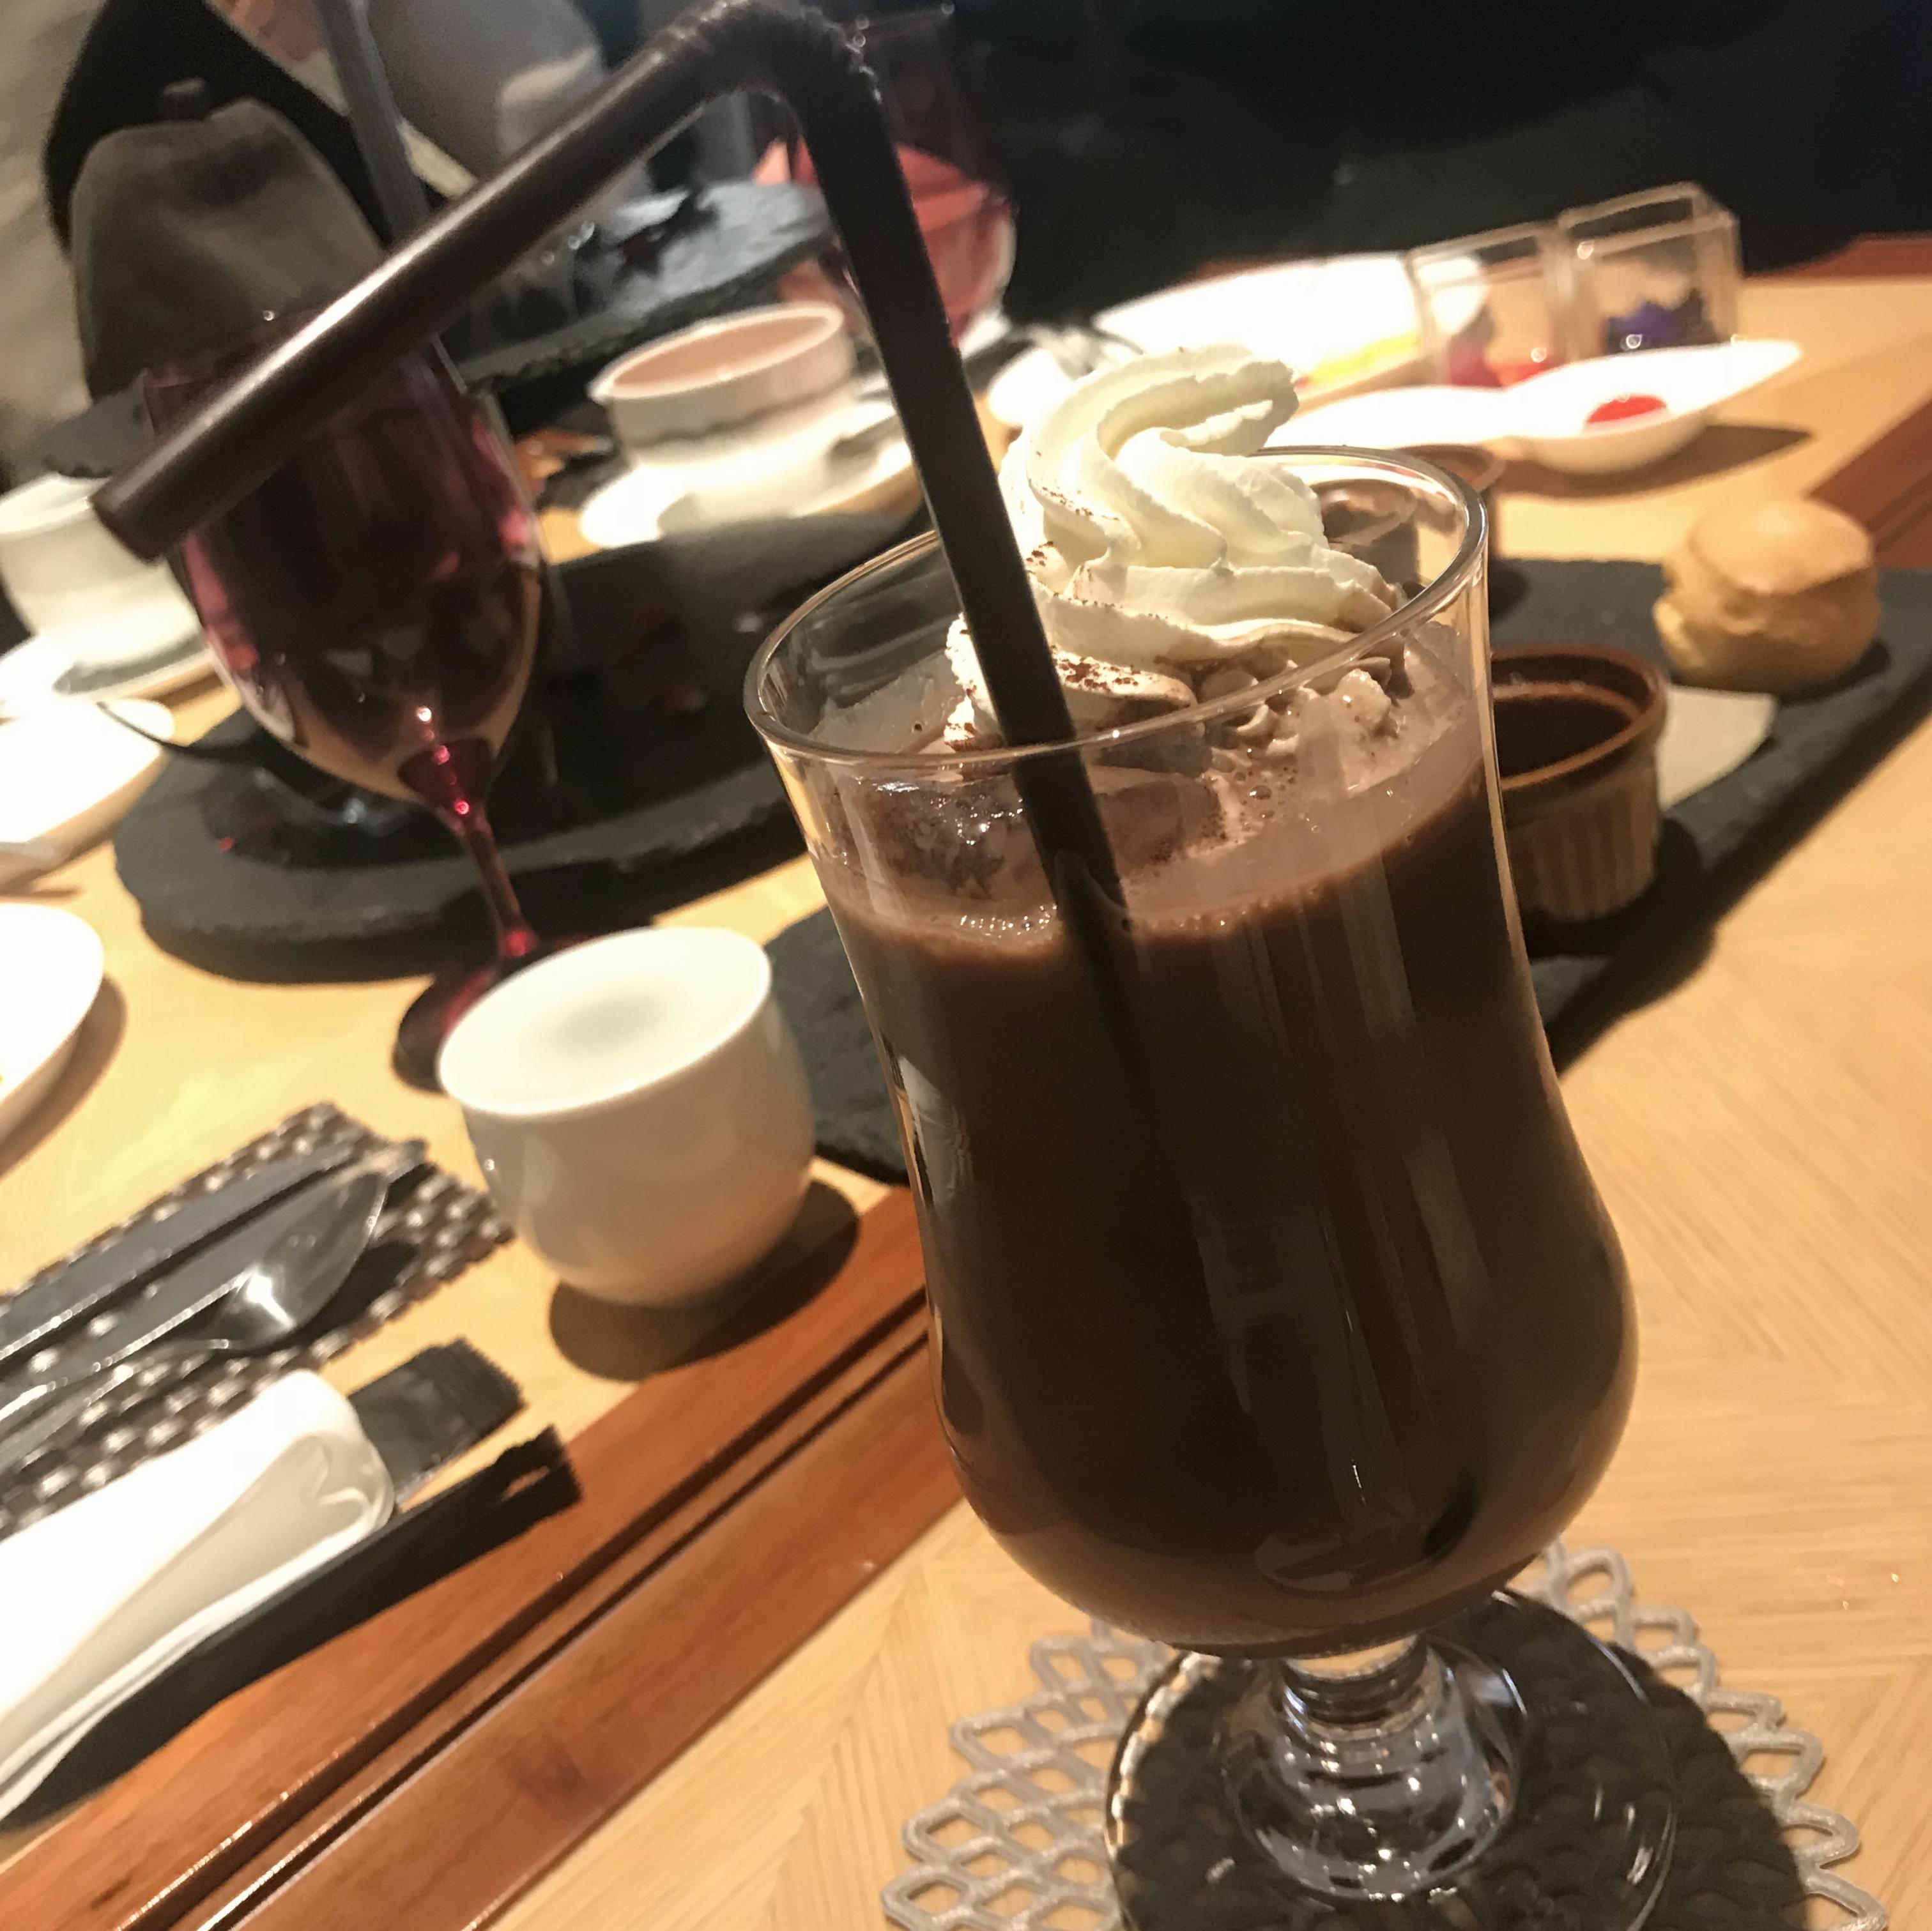 【Momiji@グランドプリンスホテル新高輪】ホテルラウンジでご褒美アフタヌーンティー♡_7